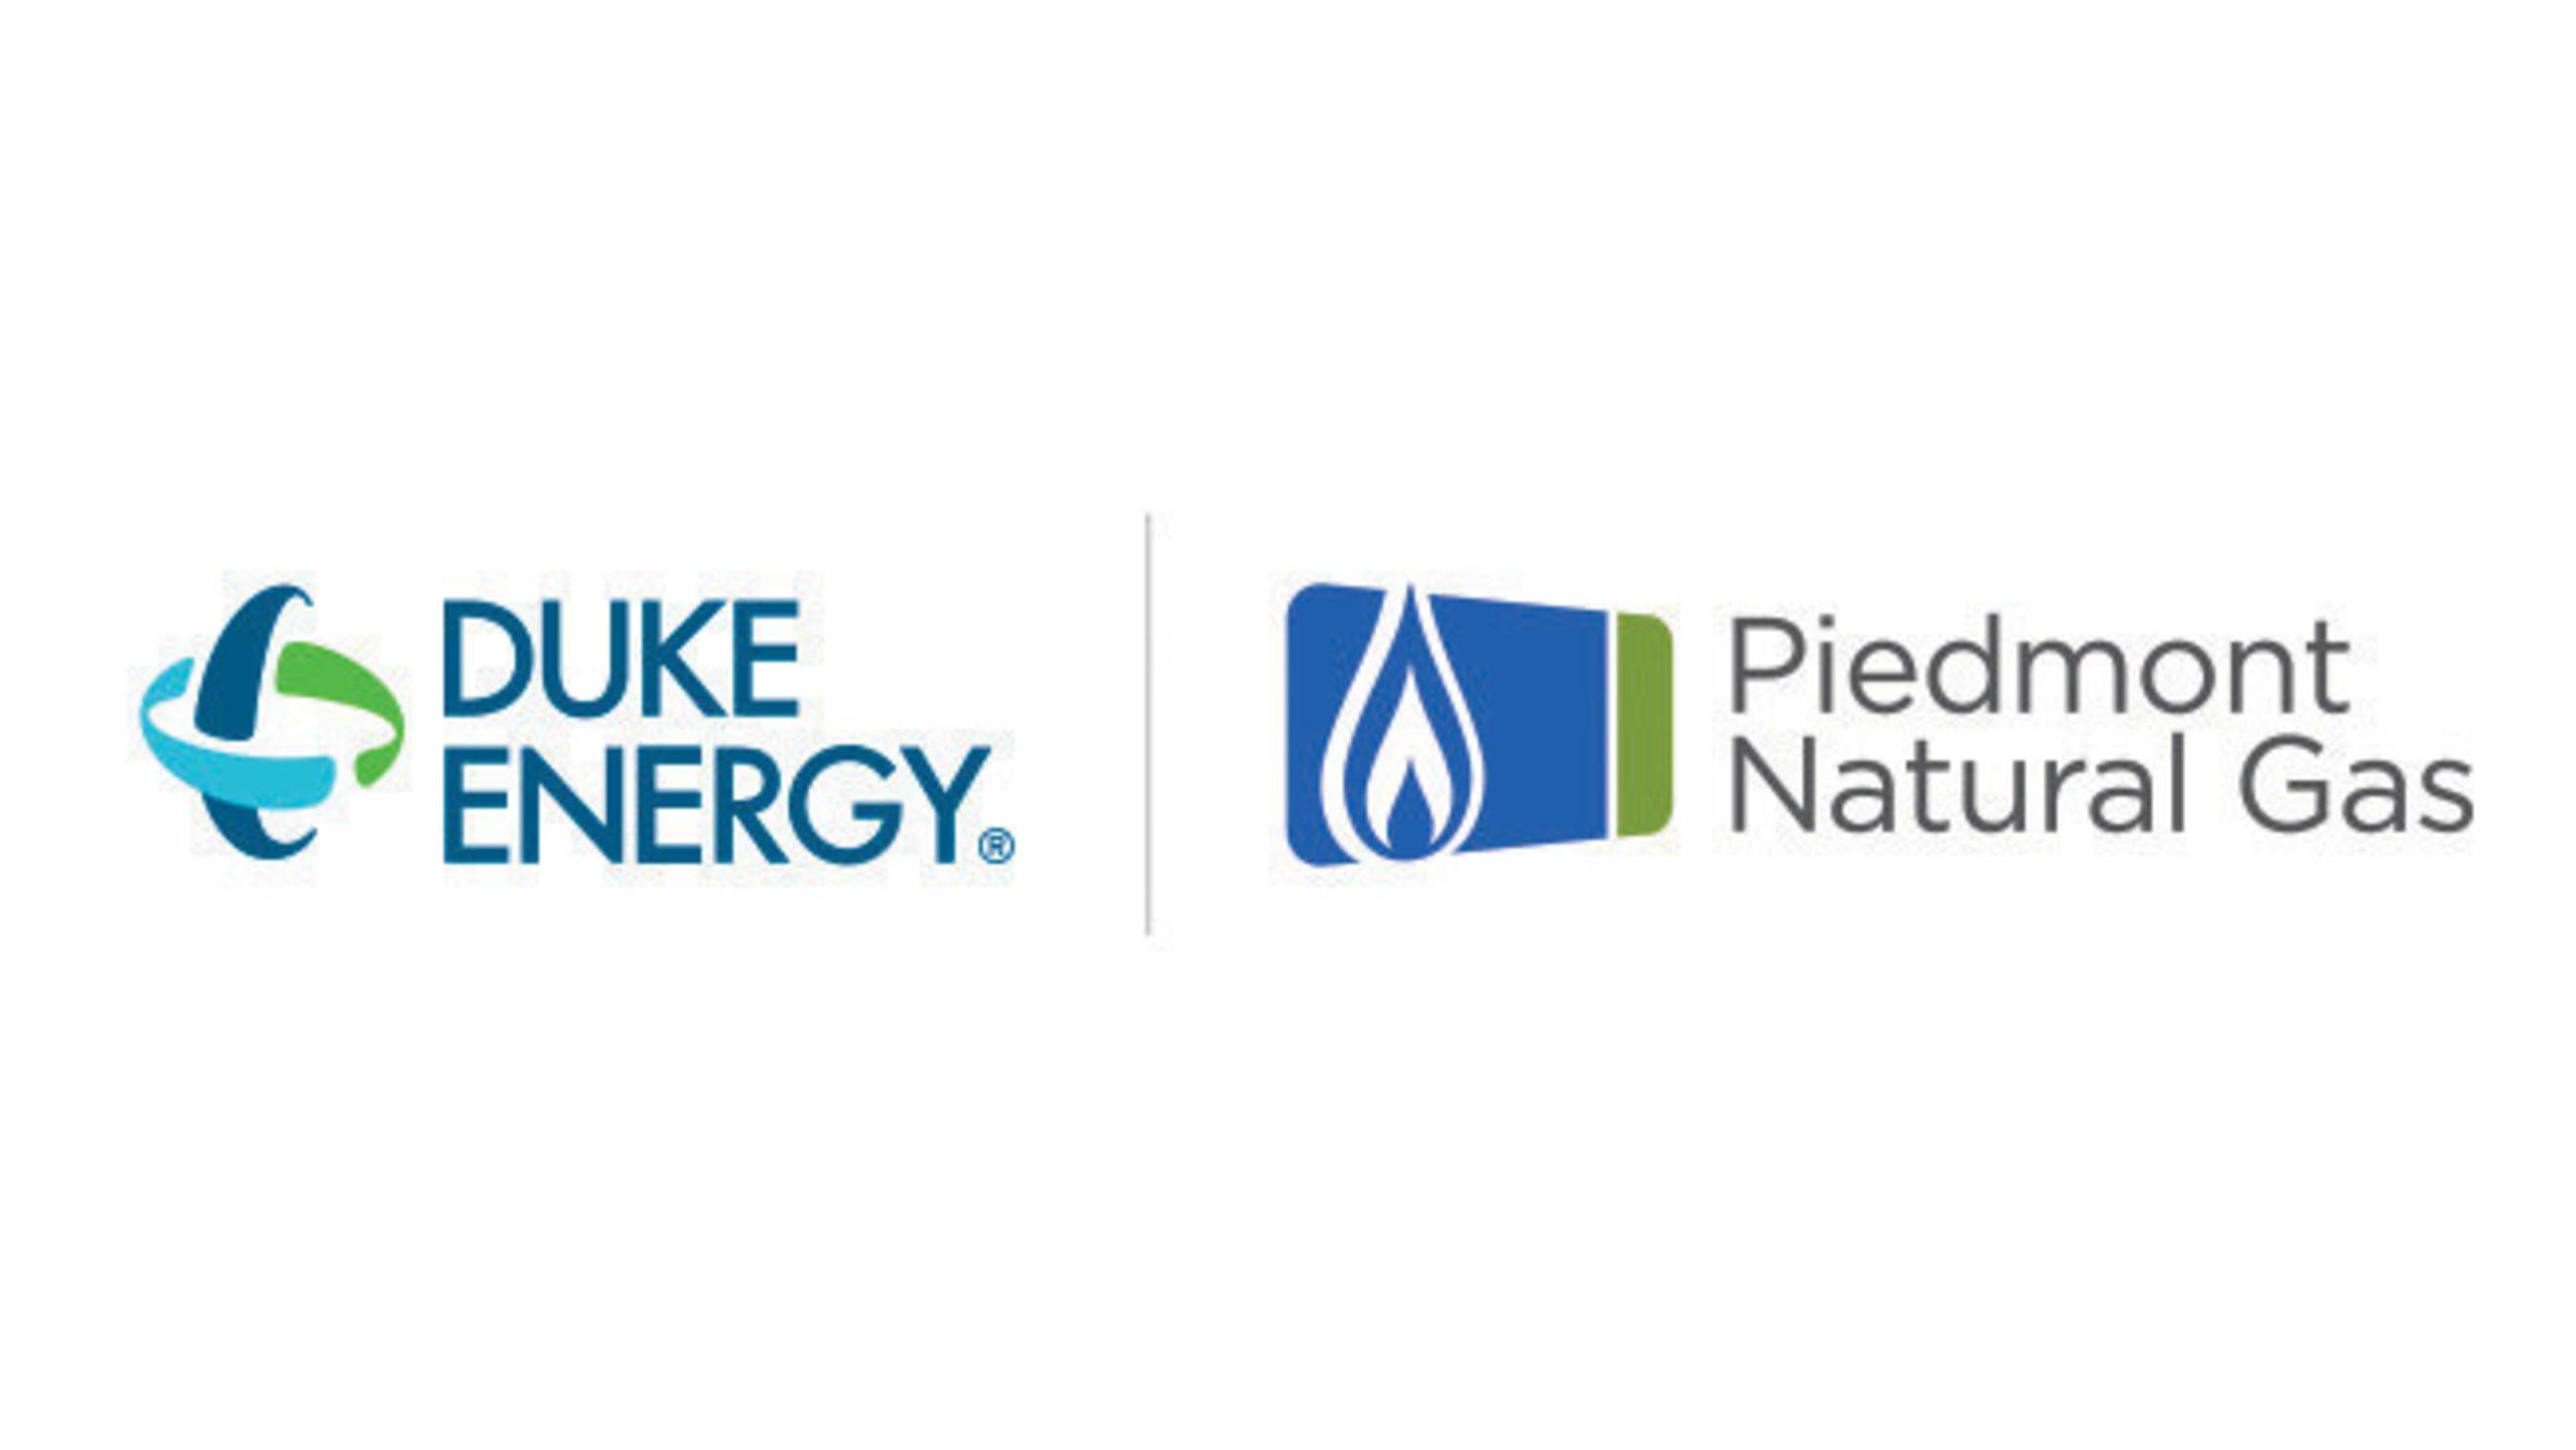 Promo Harga Piedmont Termurah 2018 Bros Ju201 Duke Energy Completes Acquisition Of Natural Gas